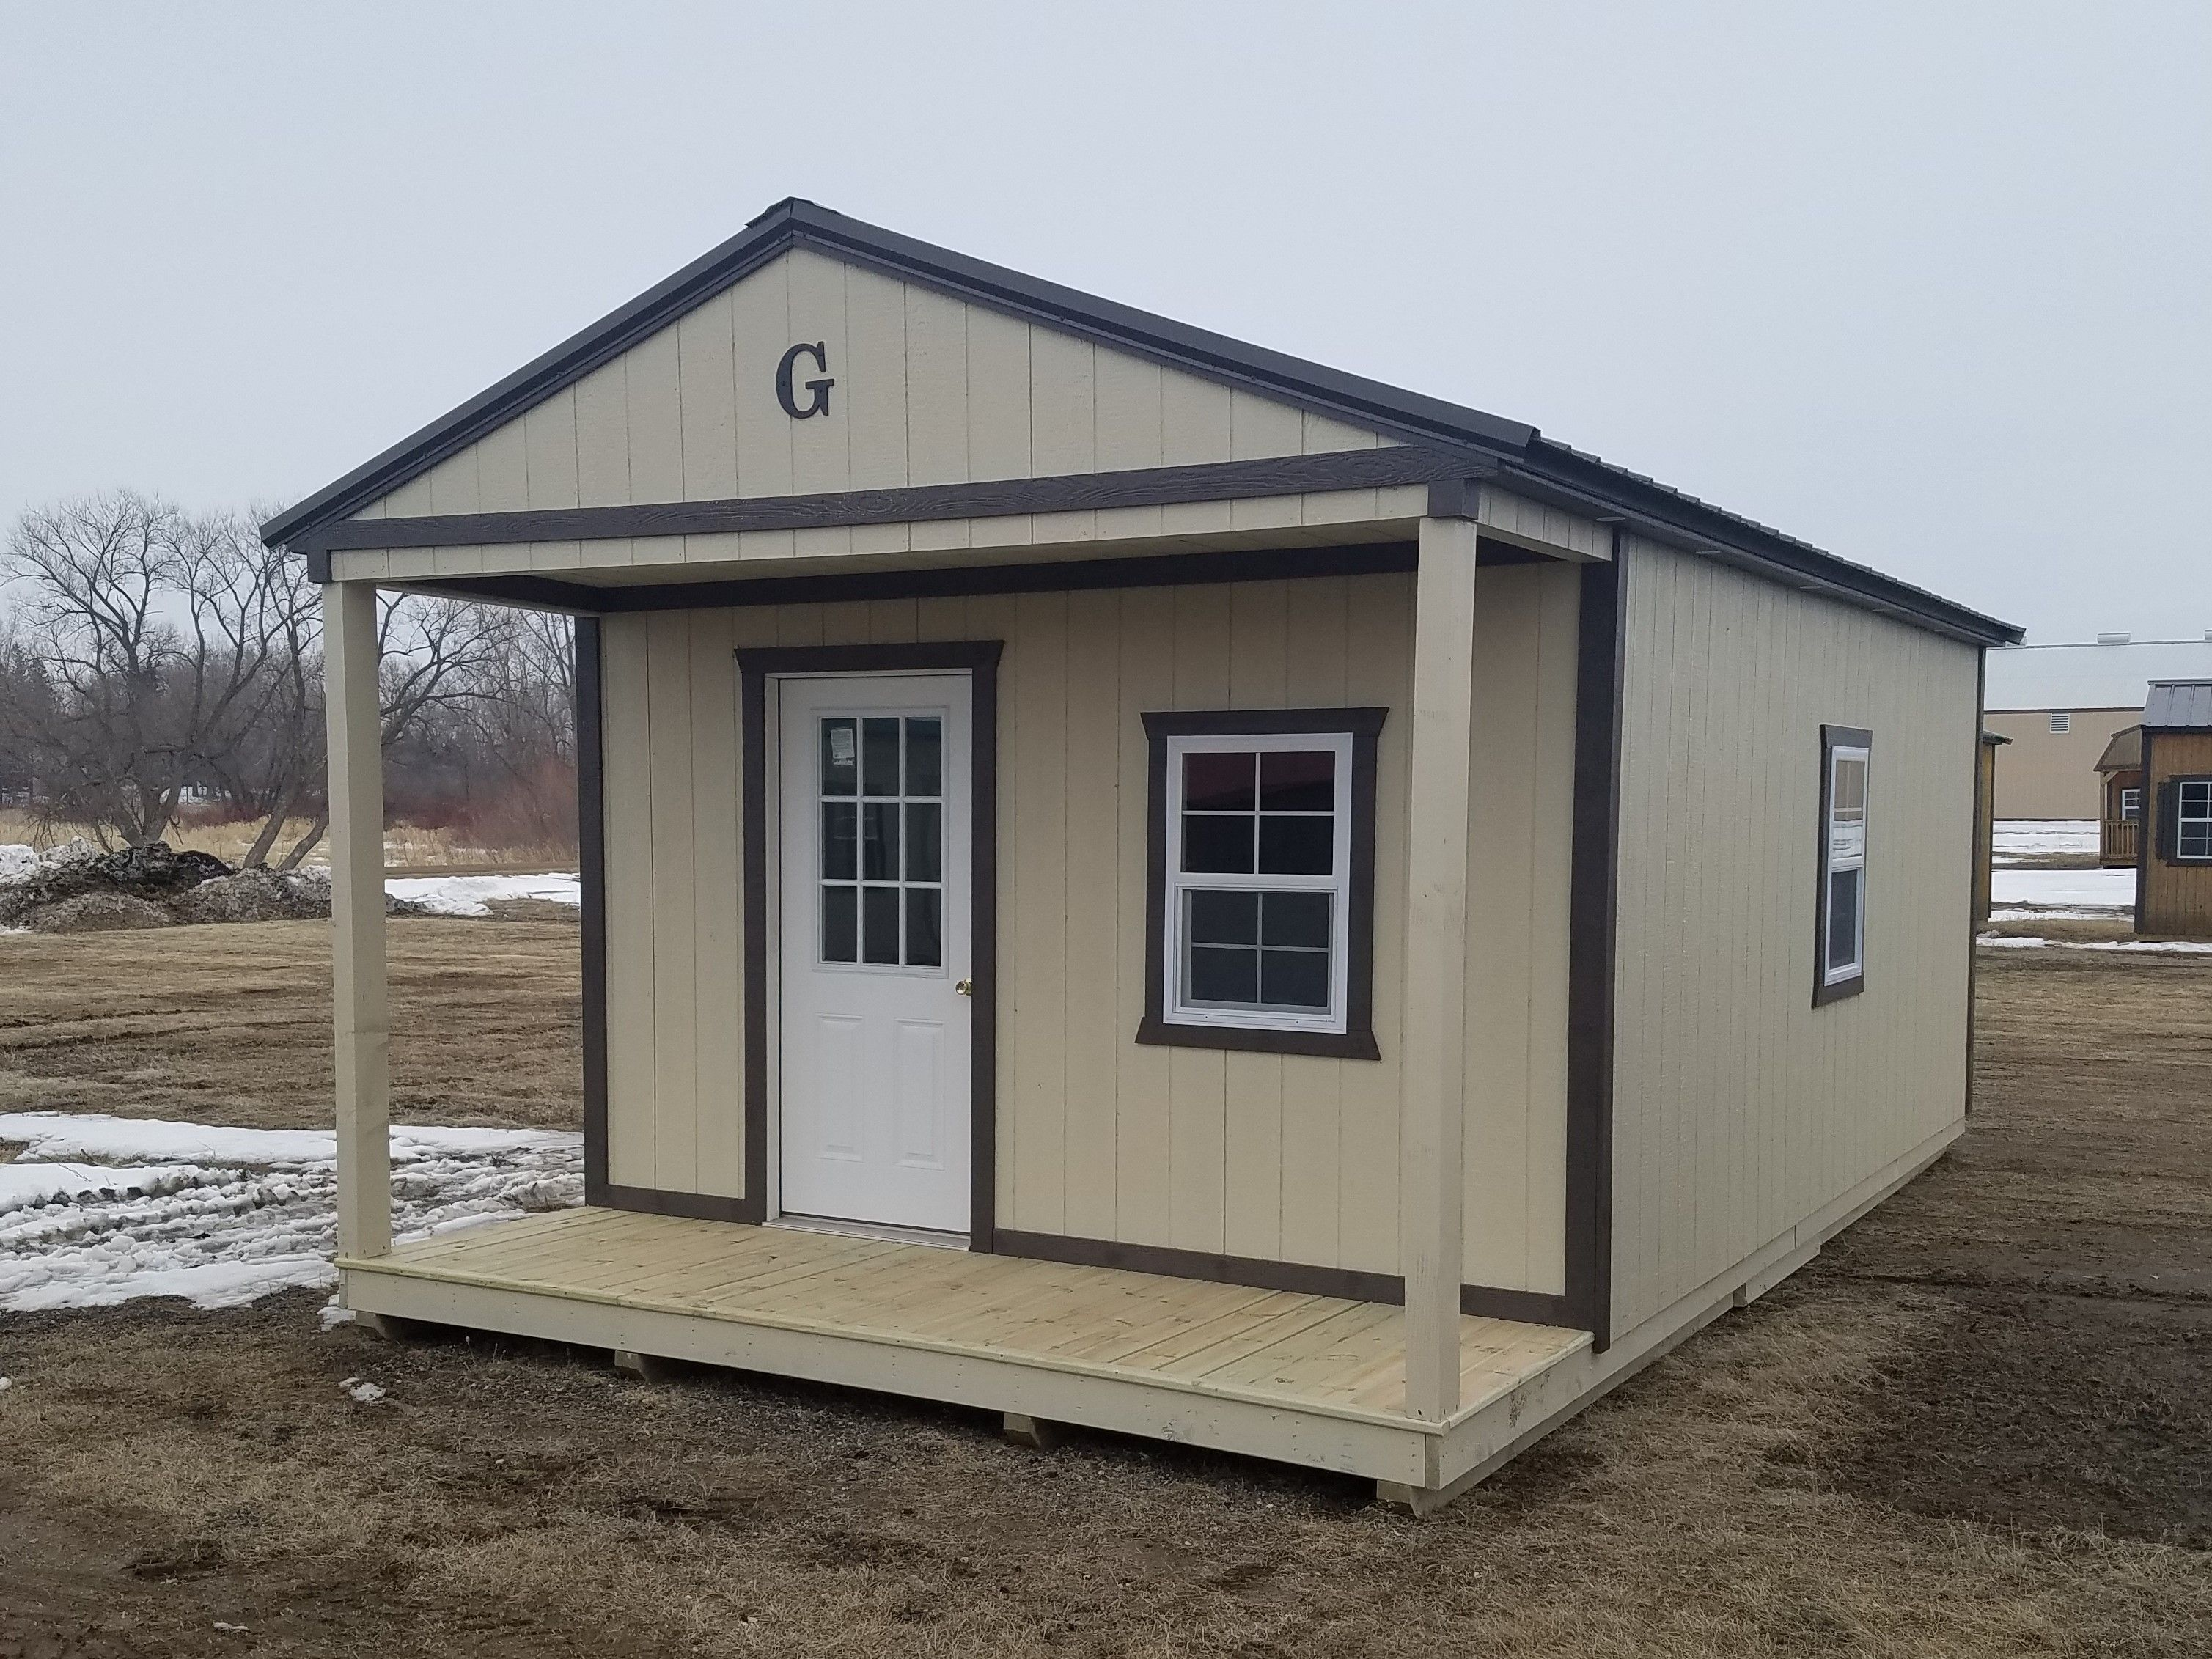 14x24 Cabin Built By Grandview Buildings Burnished Slate Metal Roof Painted Trim Lp Smartside S Pole Barn Homes Exterior Color Palette Portable Buildings